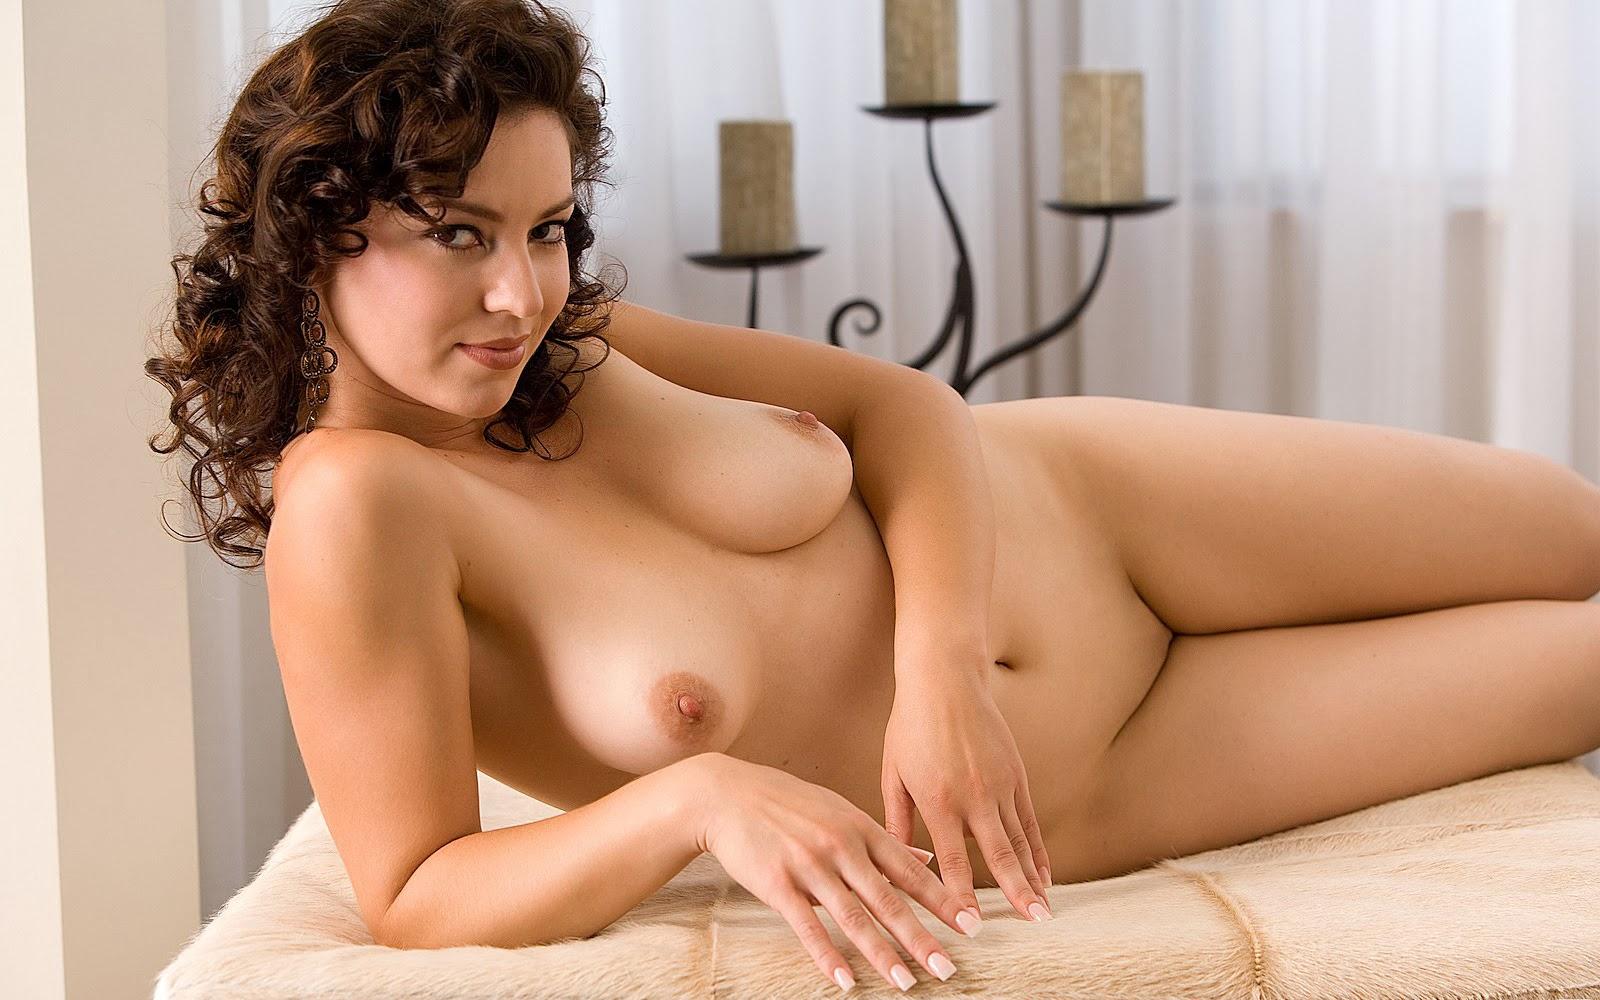 Girls celebrity nude